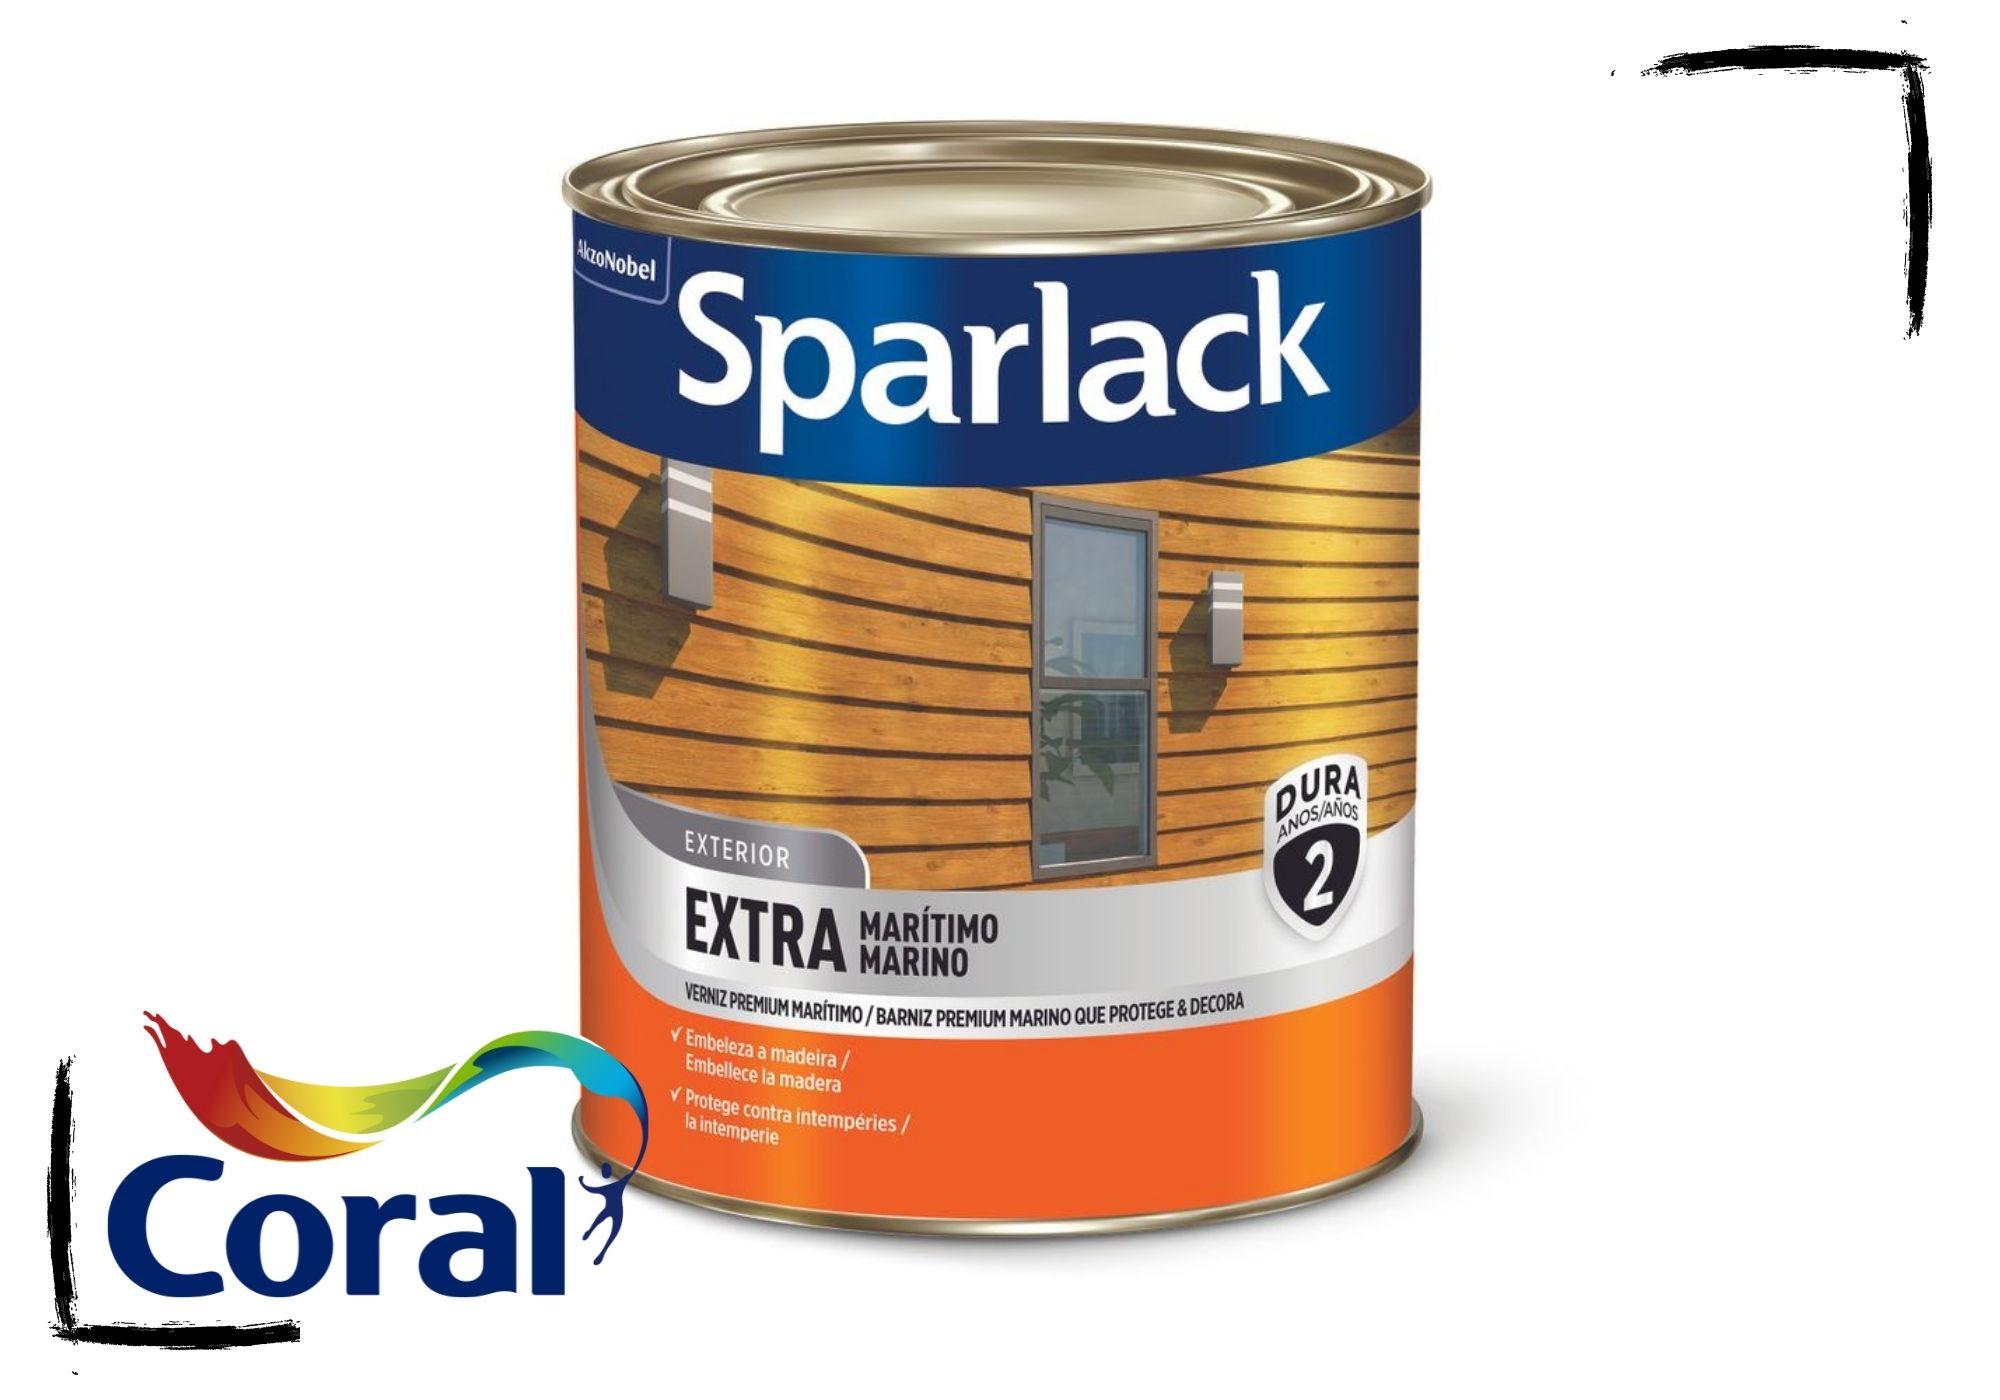 Sparlack Verniz Extra Marítimo Natural e Cores Acetinado 900ml